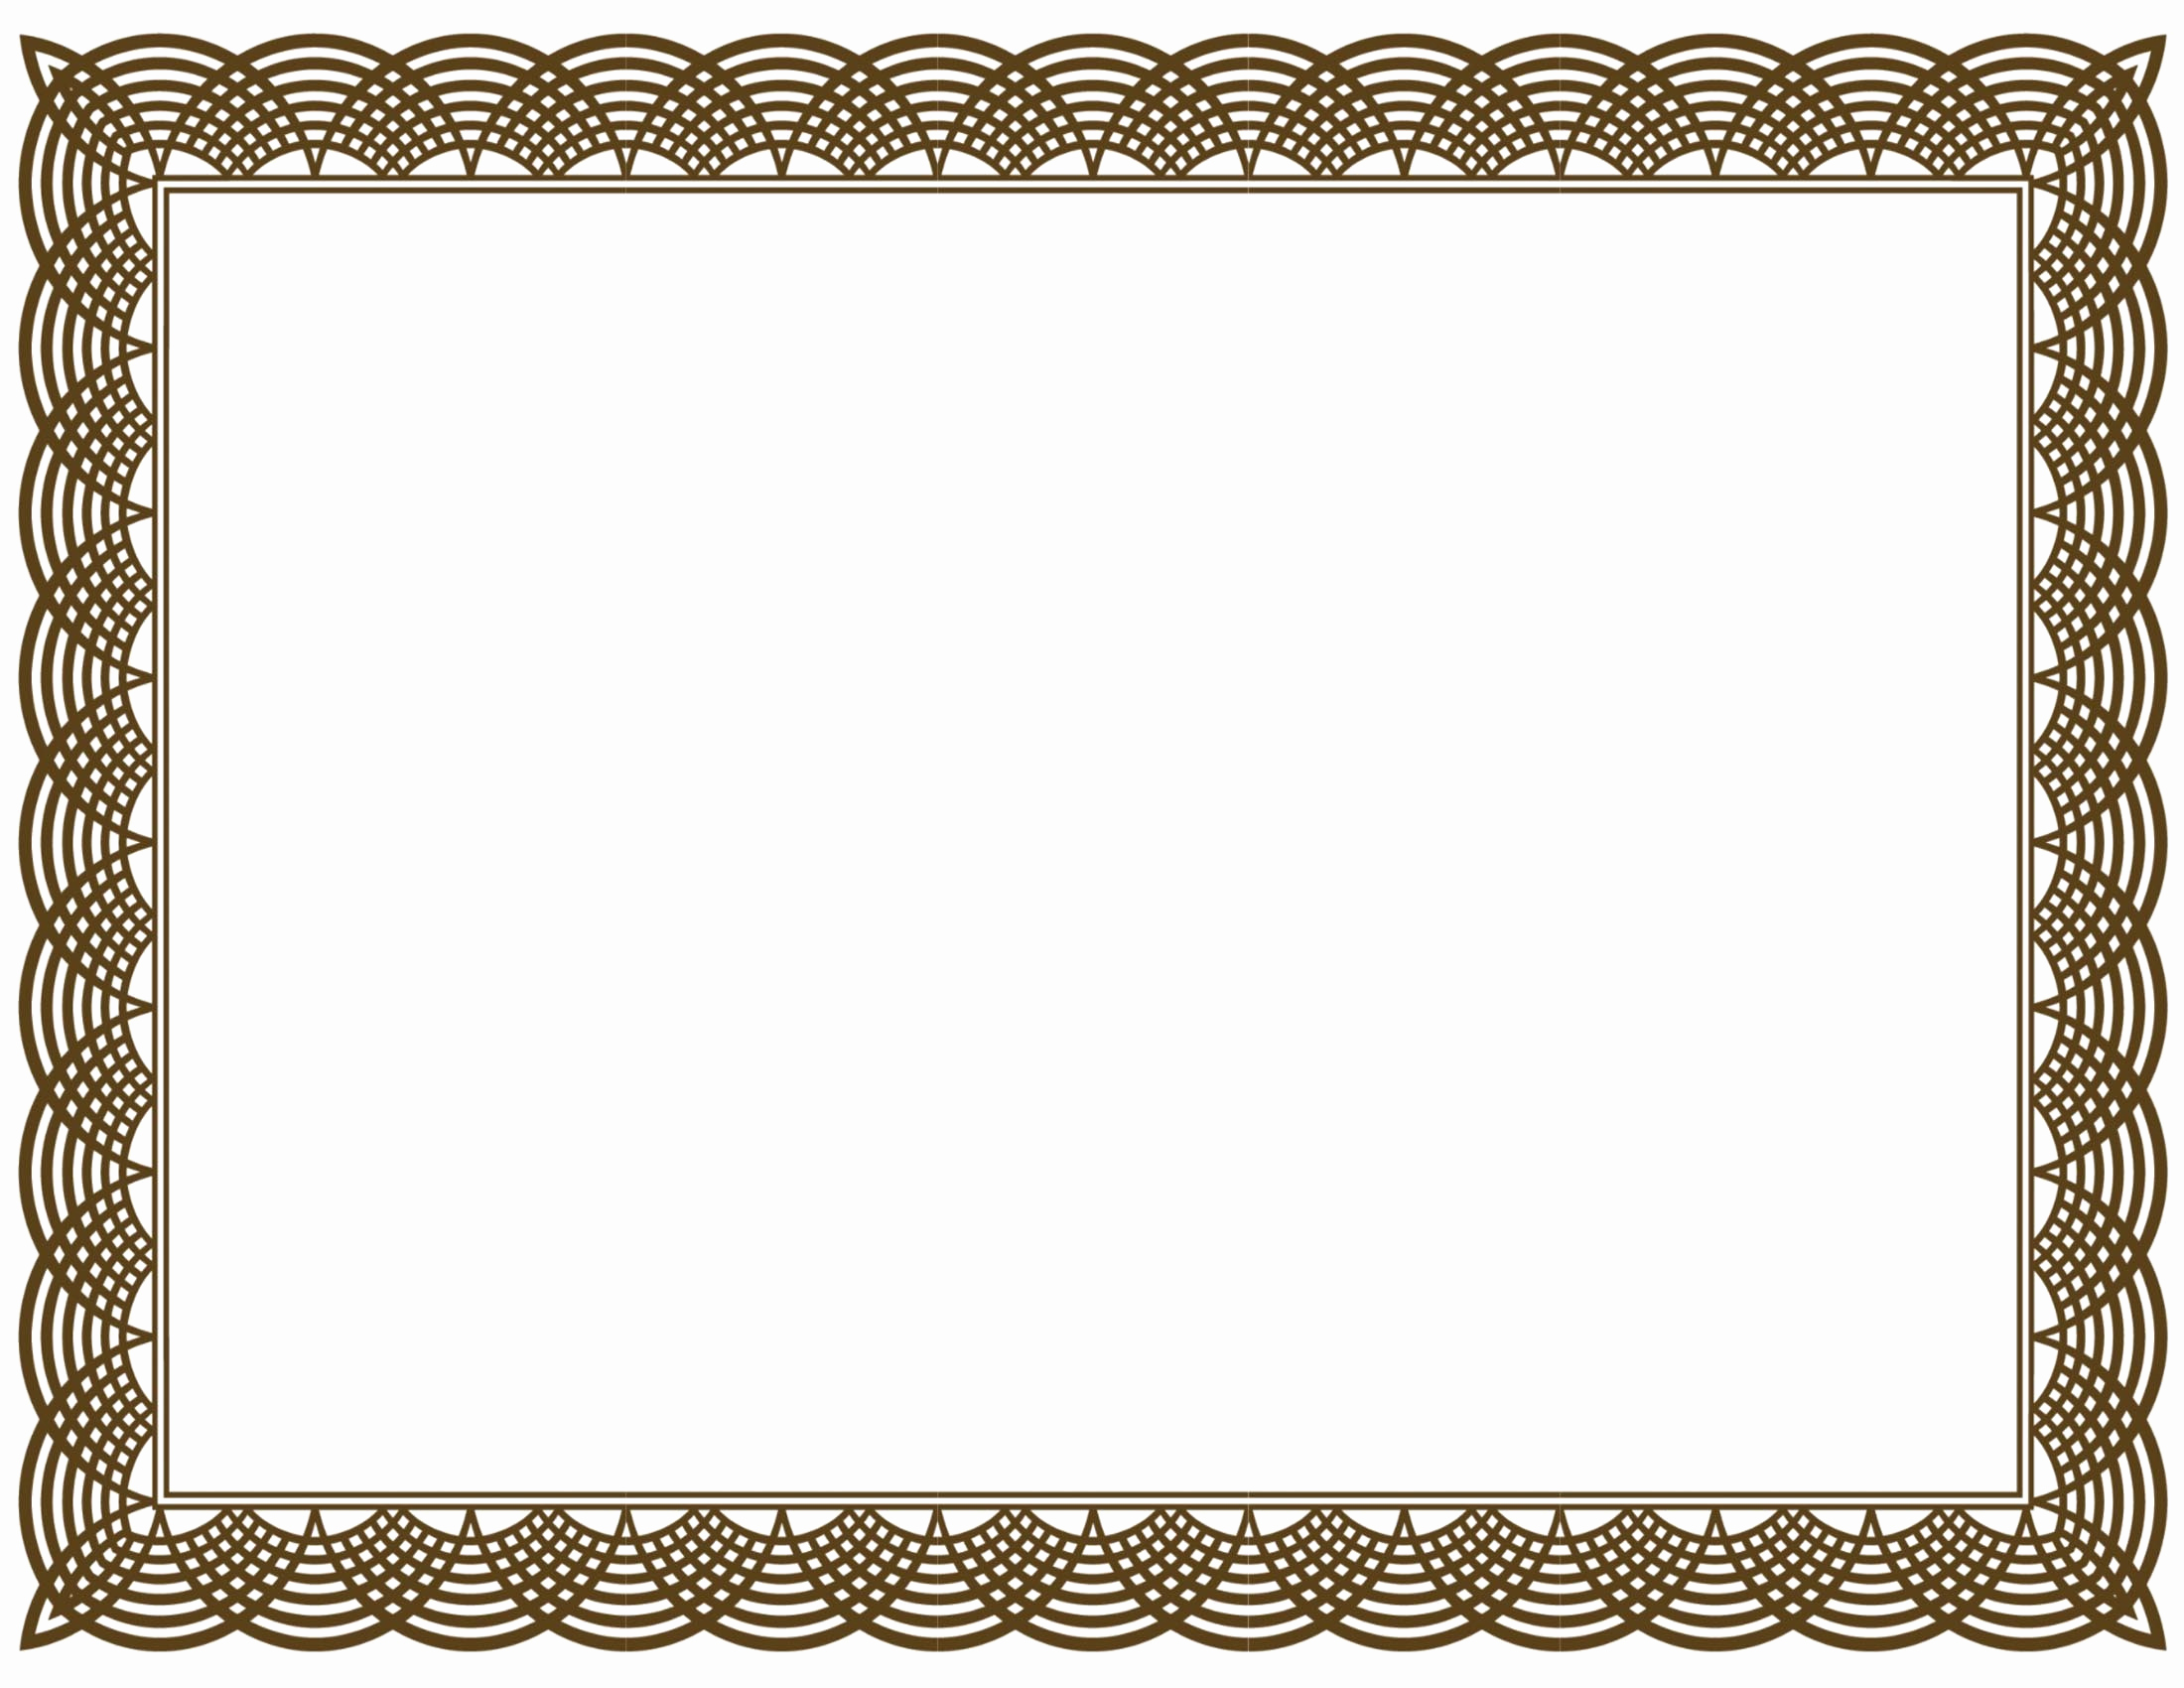 Pdf Certificate Template Free Best Of Award Certificate Border Pdf Template